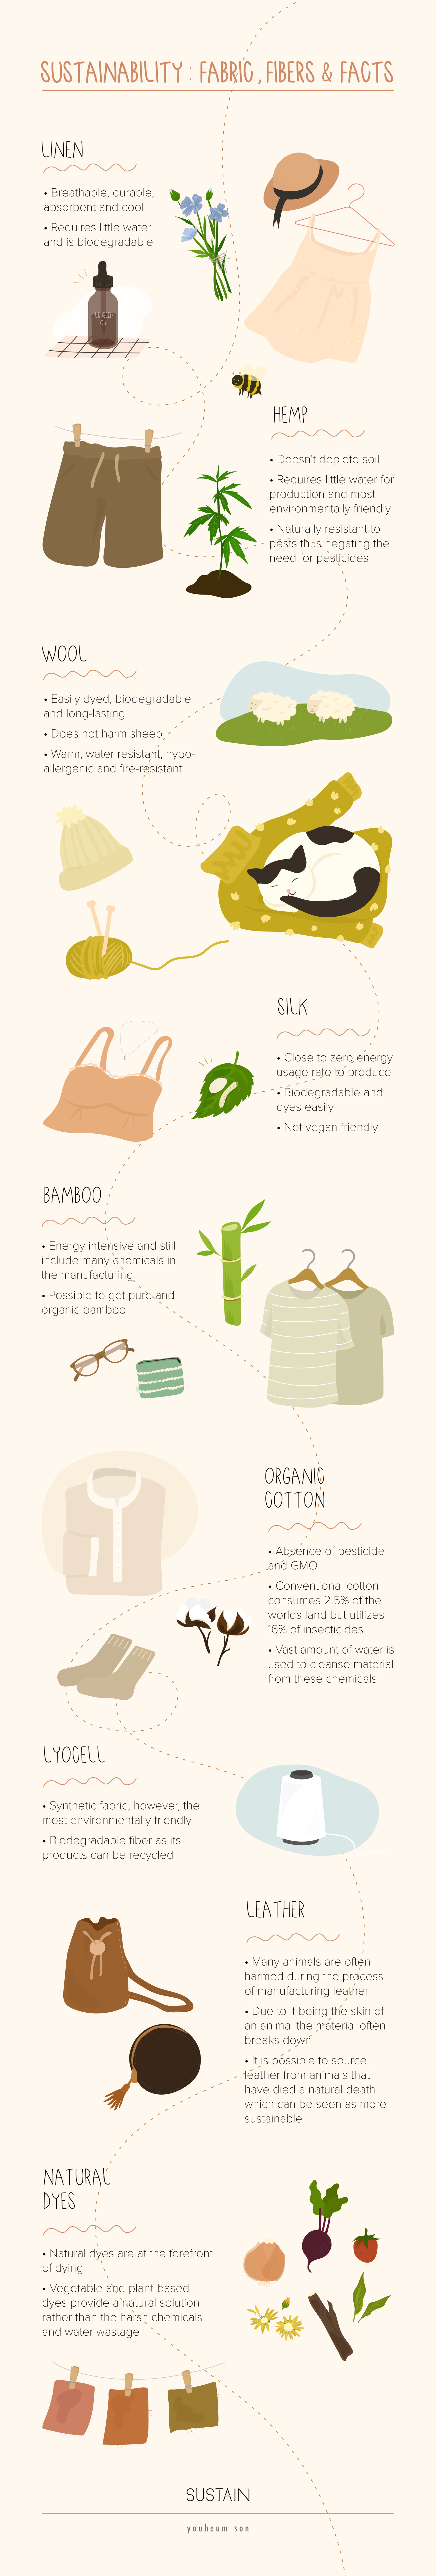 Youheum Son_Sustainability fabrics, fibers, and facts_Sustain Magazine_v2-01.png